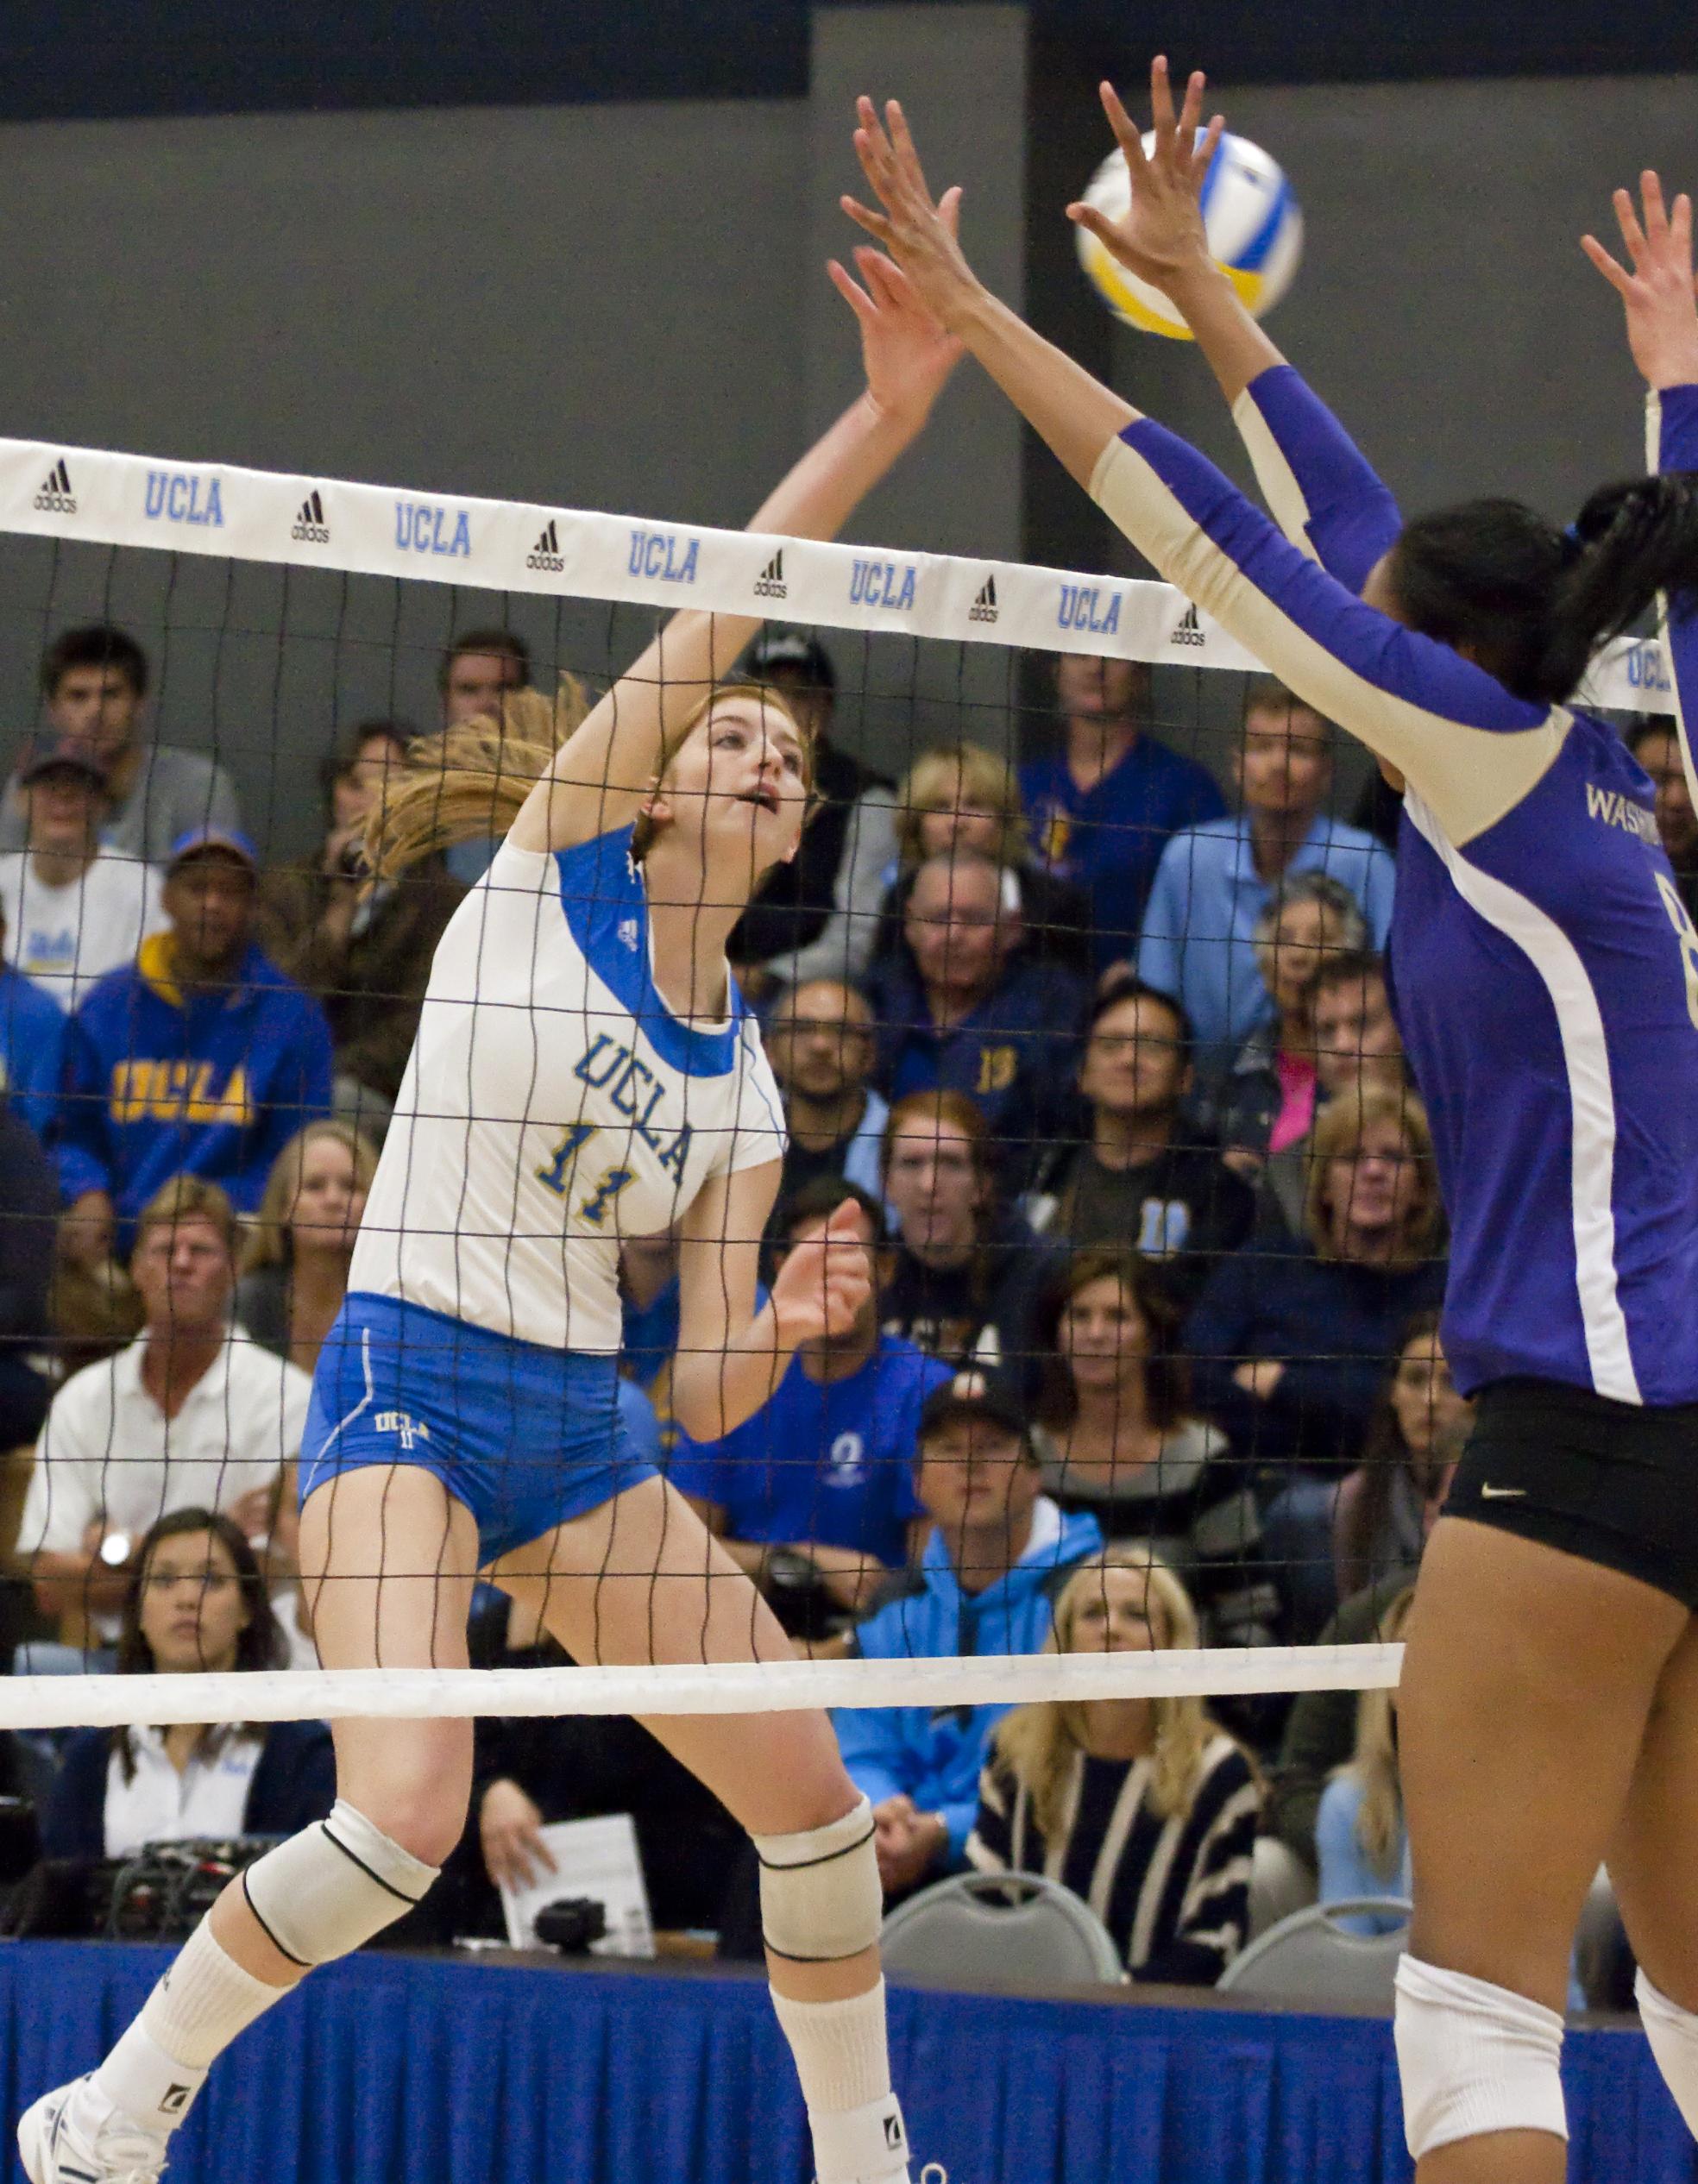 Ucla Women S Volleyball Falls To Usc 3 1 In Final Regular Season Game Daily Bruin